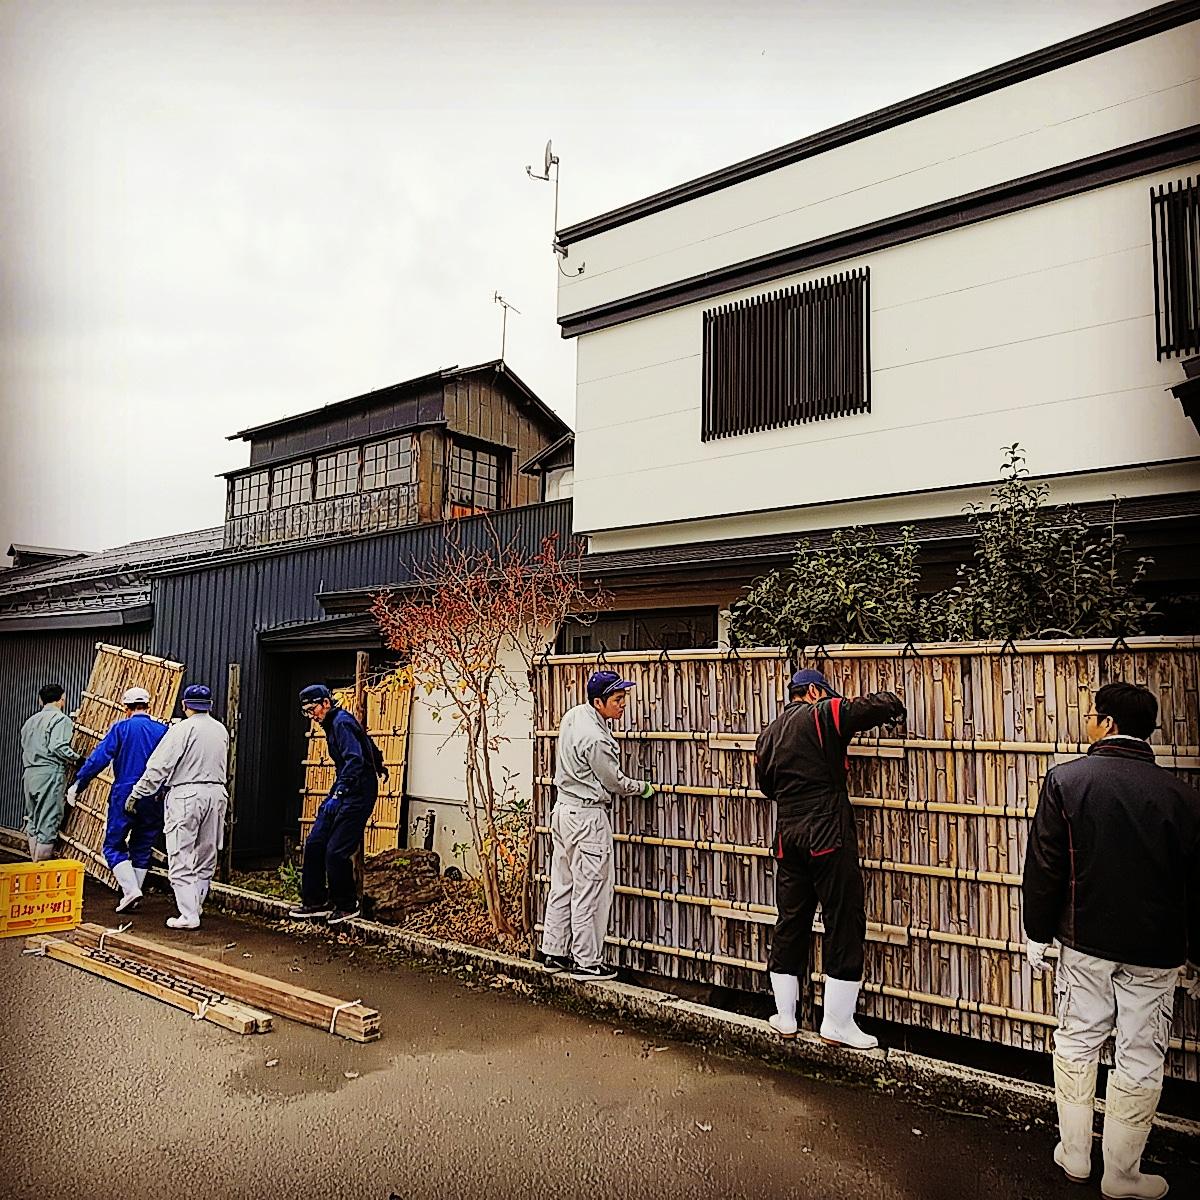 http://www.fukukomachi.com/blog/photo/IMG_20181121_141115_380.jpg